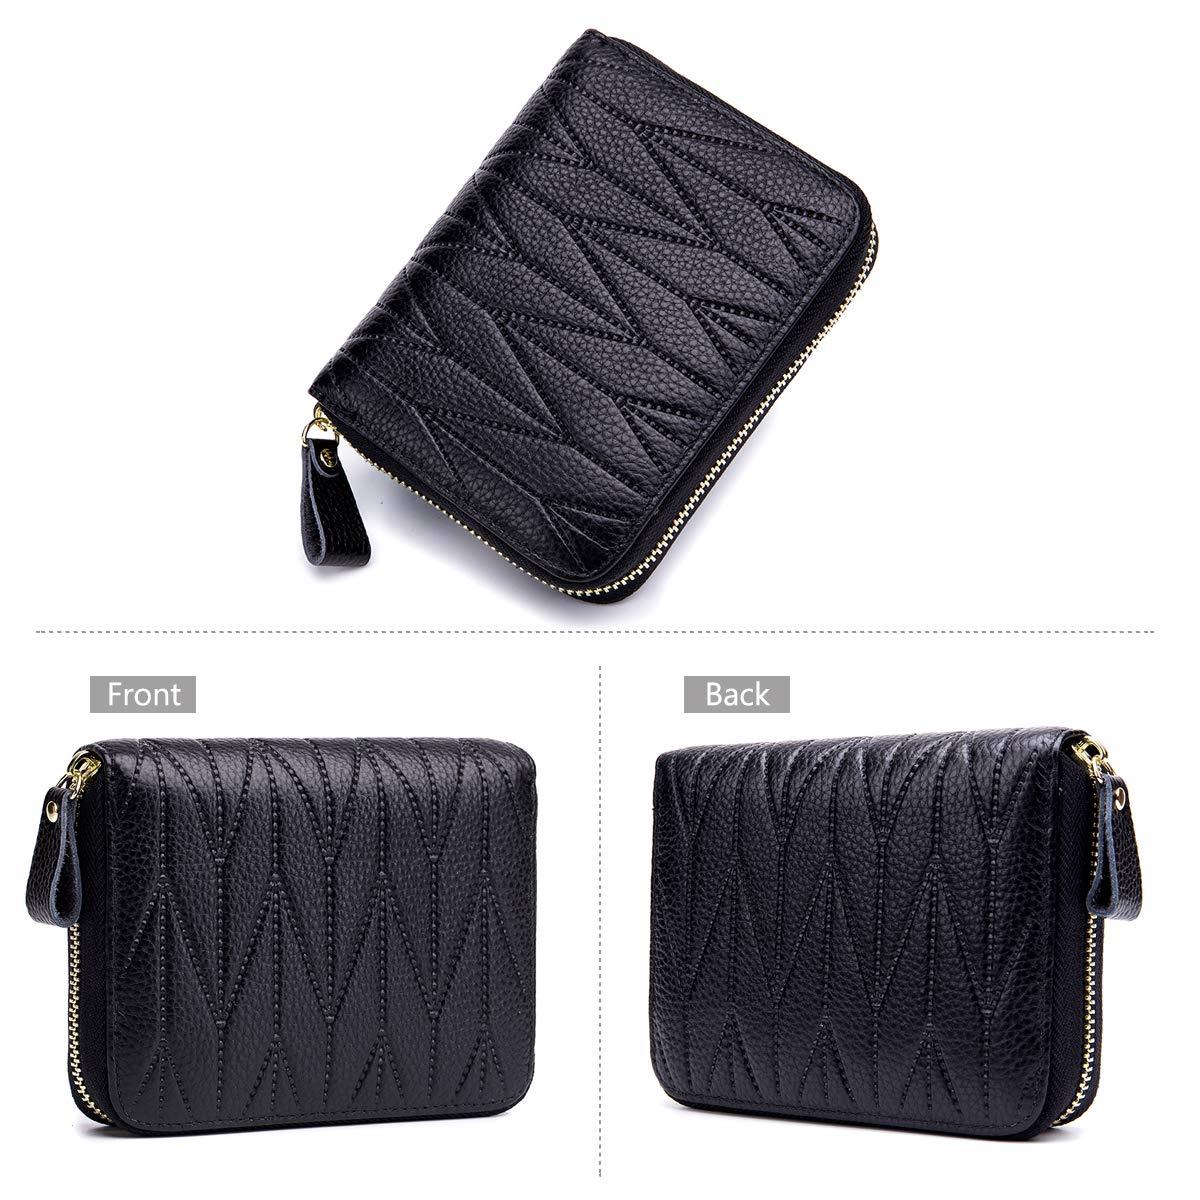 imeetu Women/men RFID Blocking Leather Credit Card Holder case Accordion Wallet 24 Slots Purses with Zipper Pocket(Wine Red) by imeetu (Image #6)